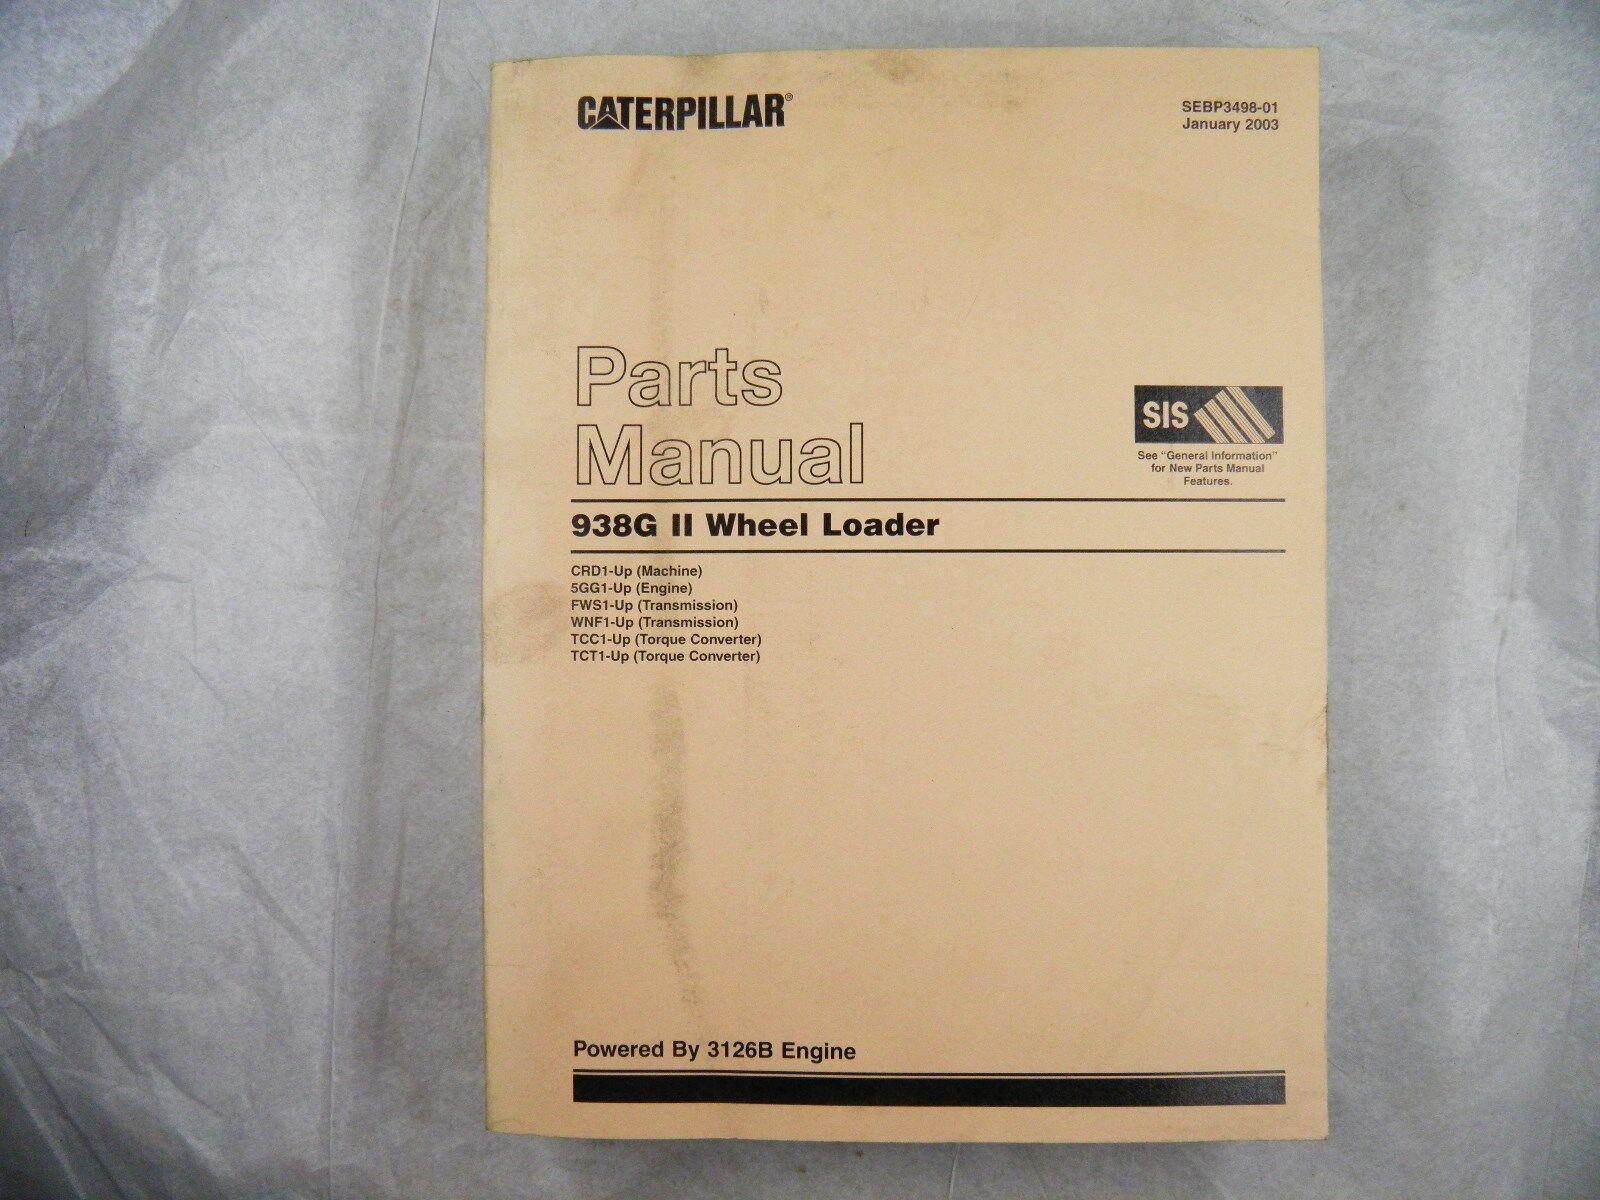 Cat Parts Diagram Car Names Wiring Database 3204 Engine Caterpillar 938g Ii Manual Book Catalog Wheel Loader Crd1 Chart